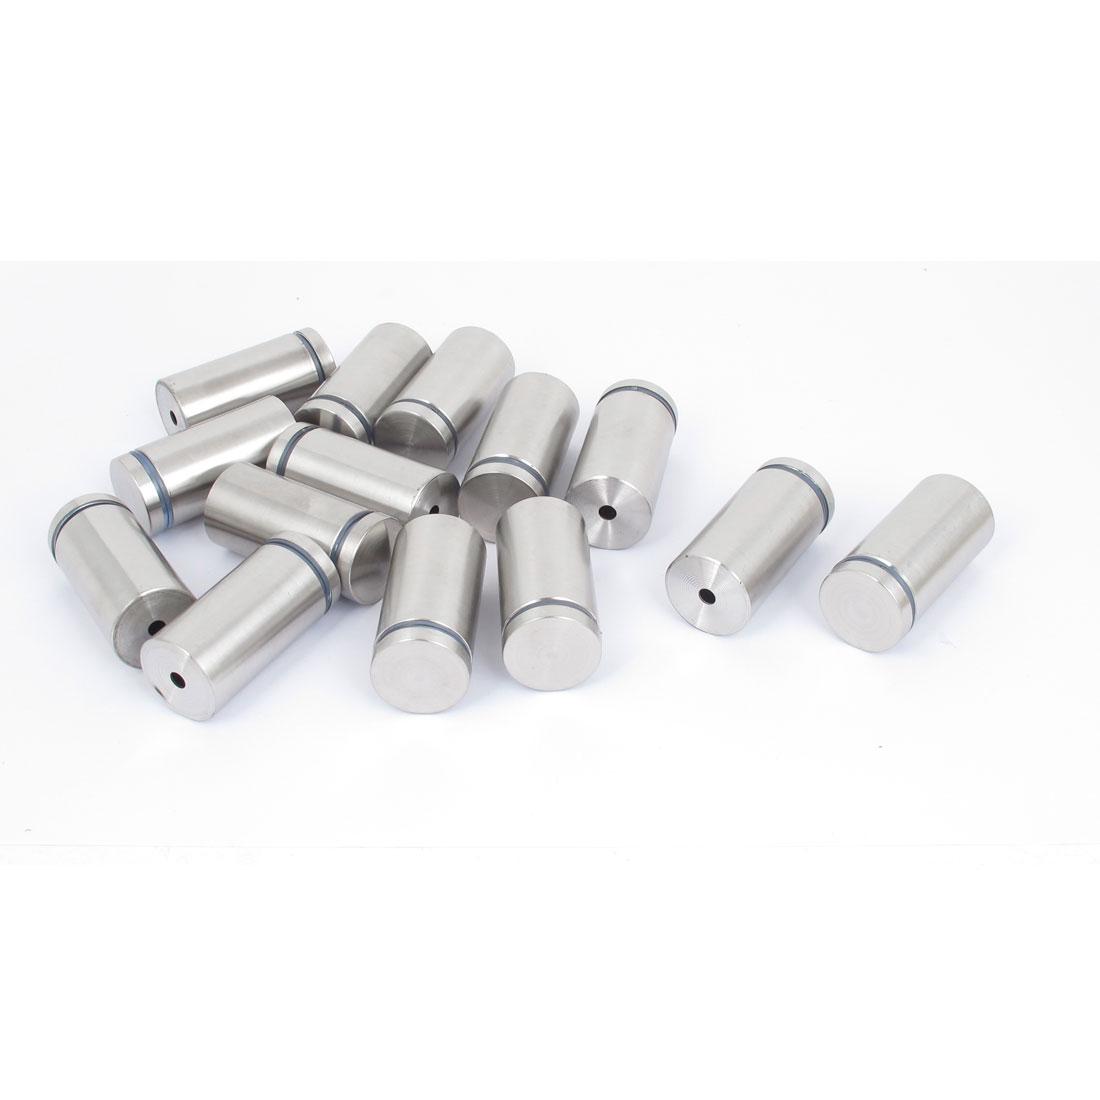 25mm x 50mm Stainless Steel Advertising Frameless Glass Standoff Pins 14pcs